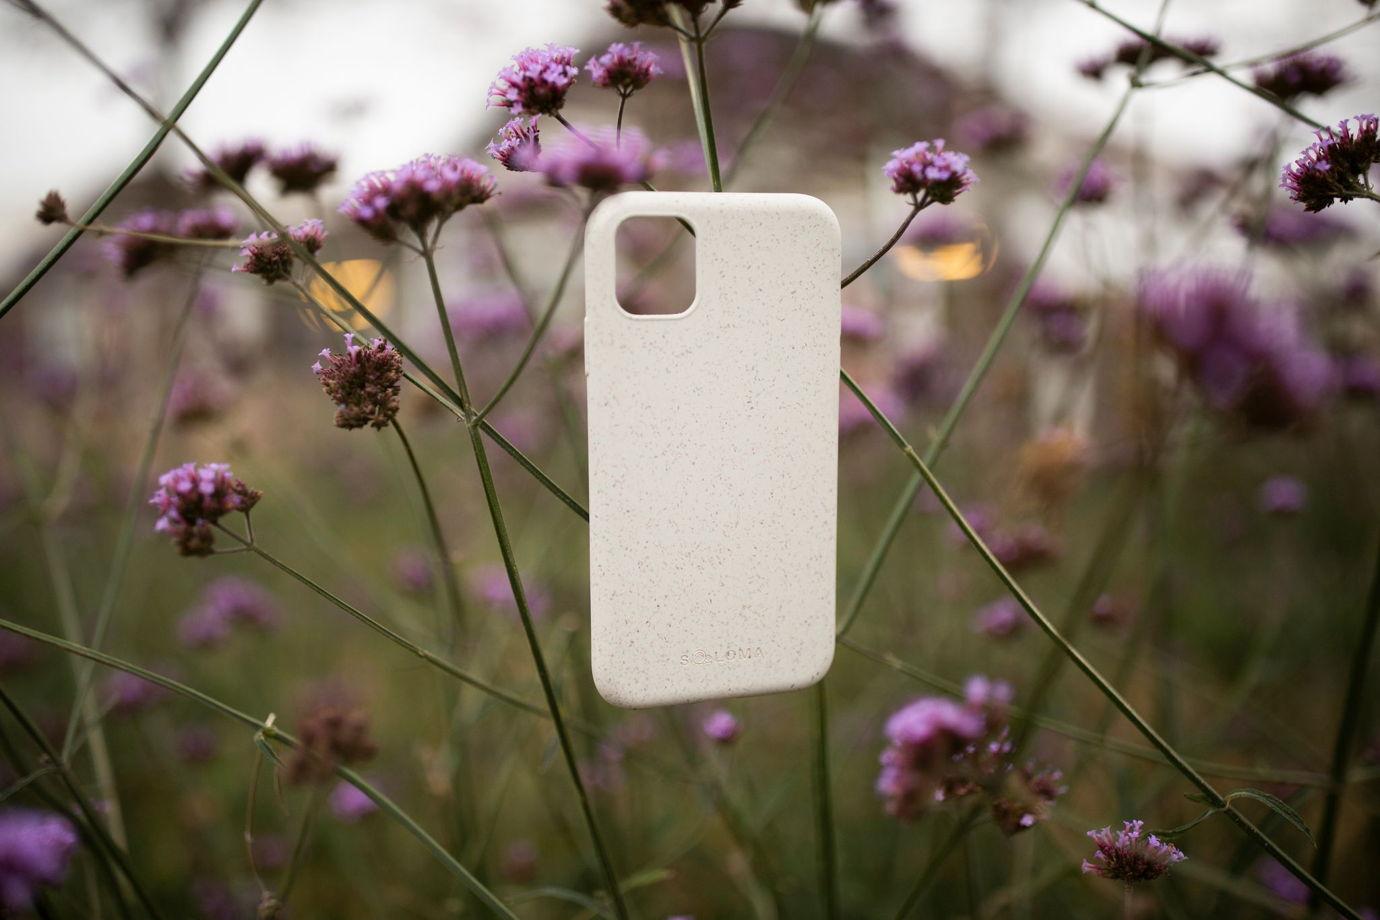 Биоразлагаемый чехол SOLOMA для iPhone 7/8 Пшеница